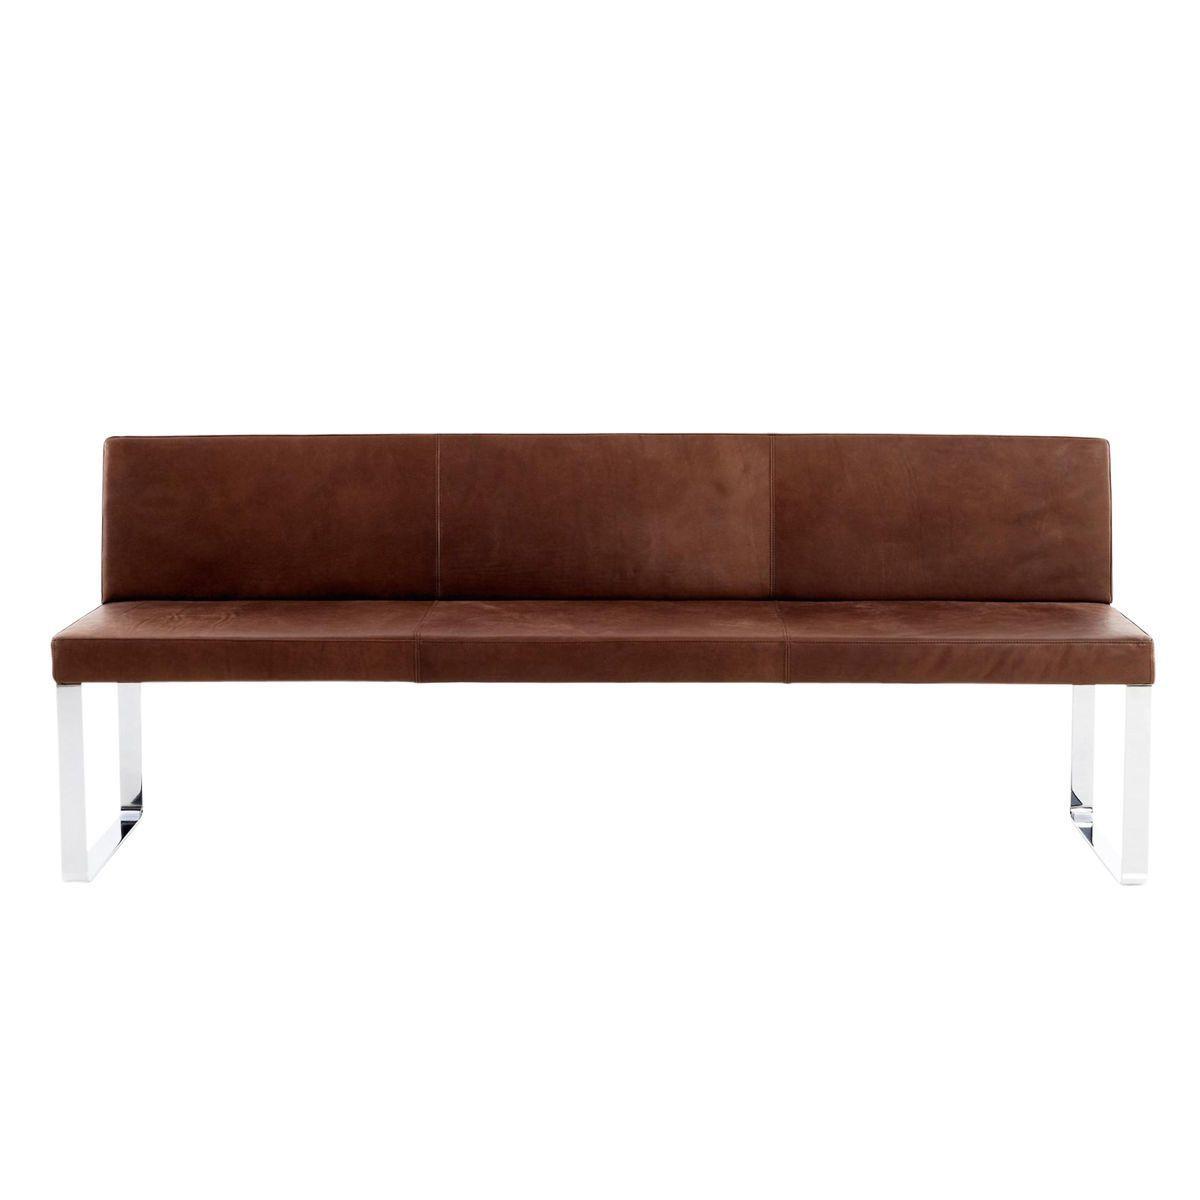 sitzbank leder amazing bank braun sitzbank braun bezug. Black Bedroom Furniture Sets. Home Design Ideas